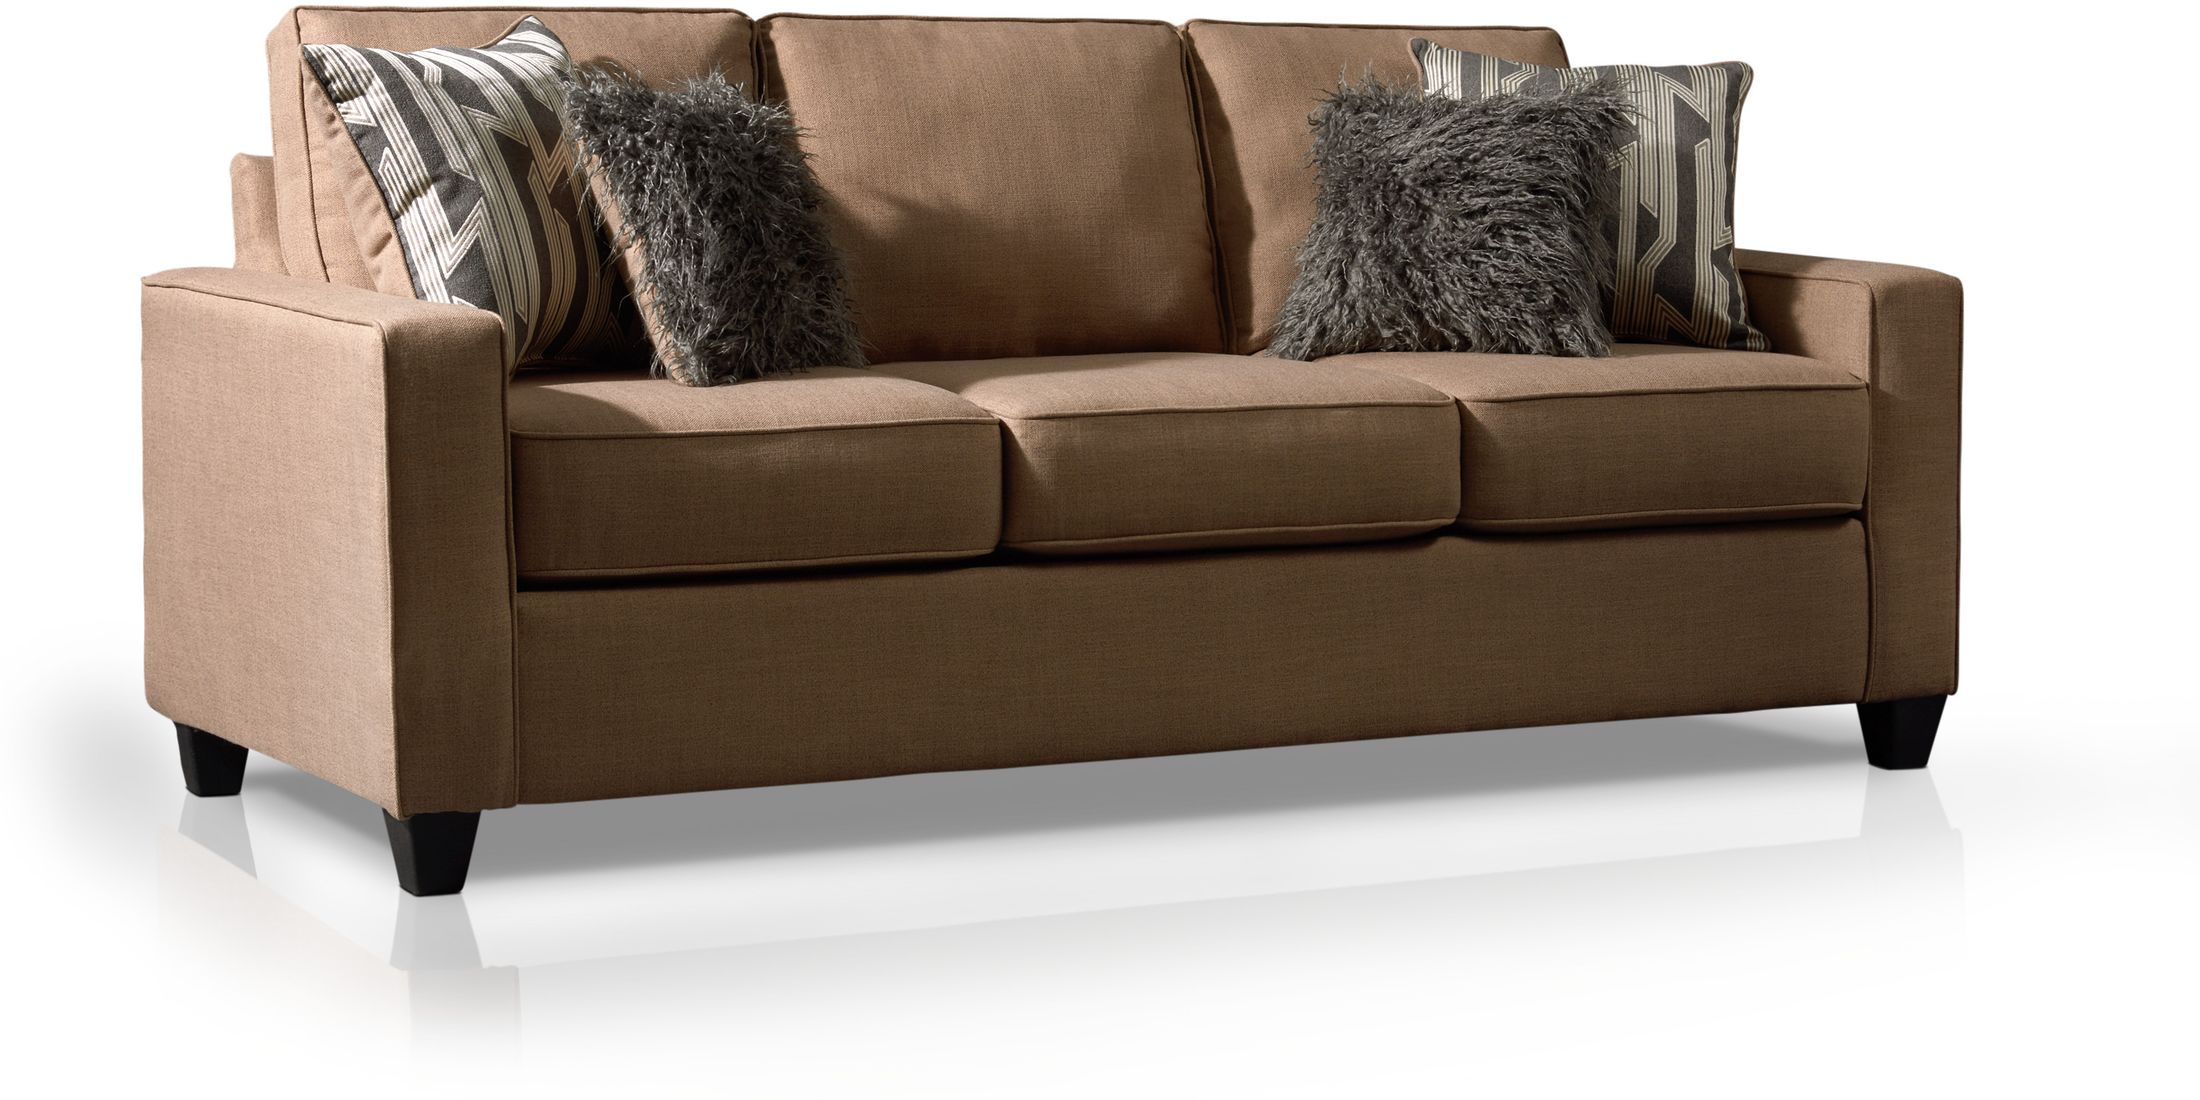 Living Room Furniture - Burton Queen Sleeper Sofa